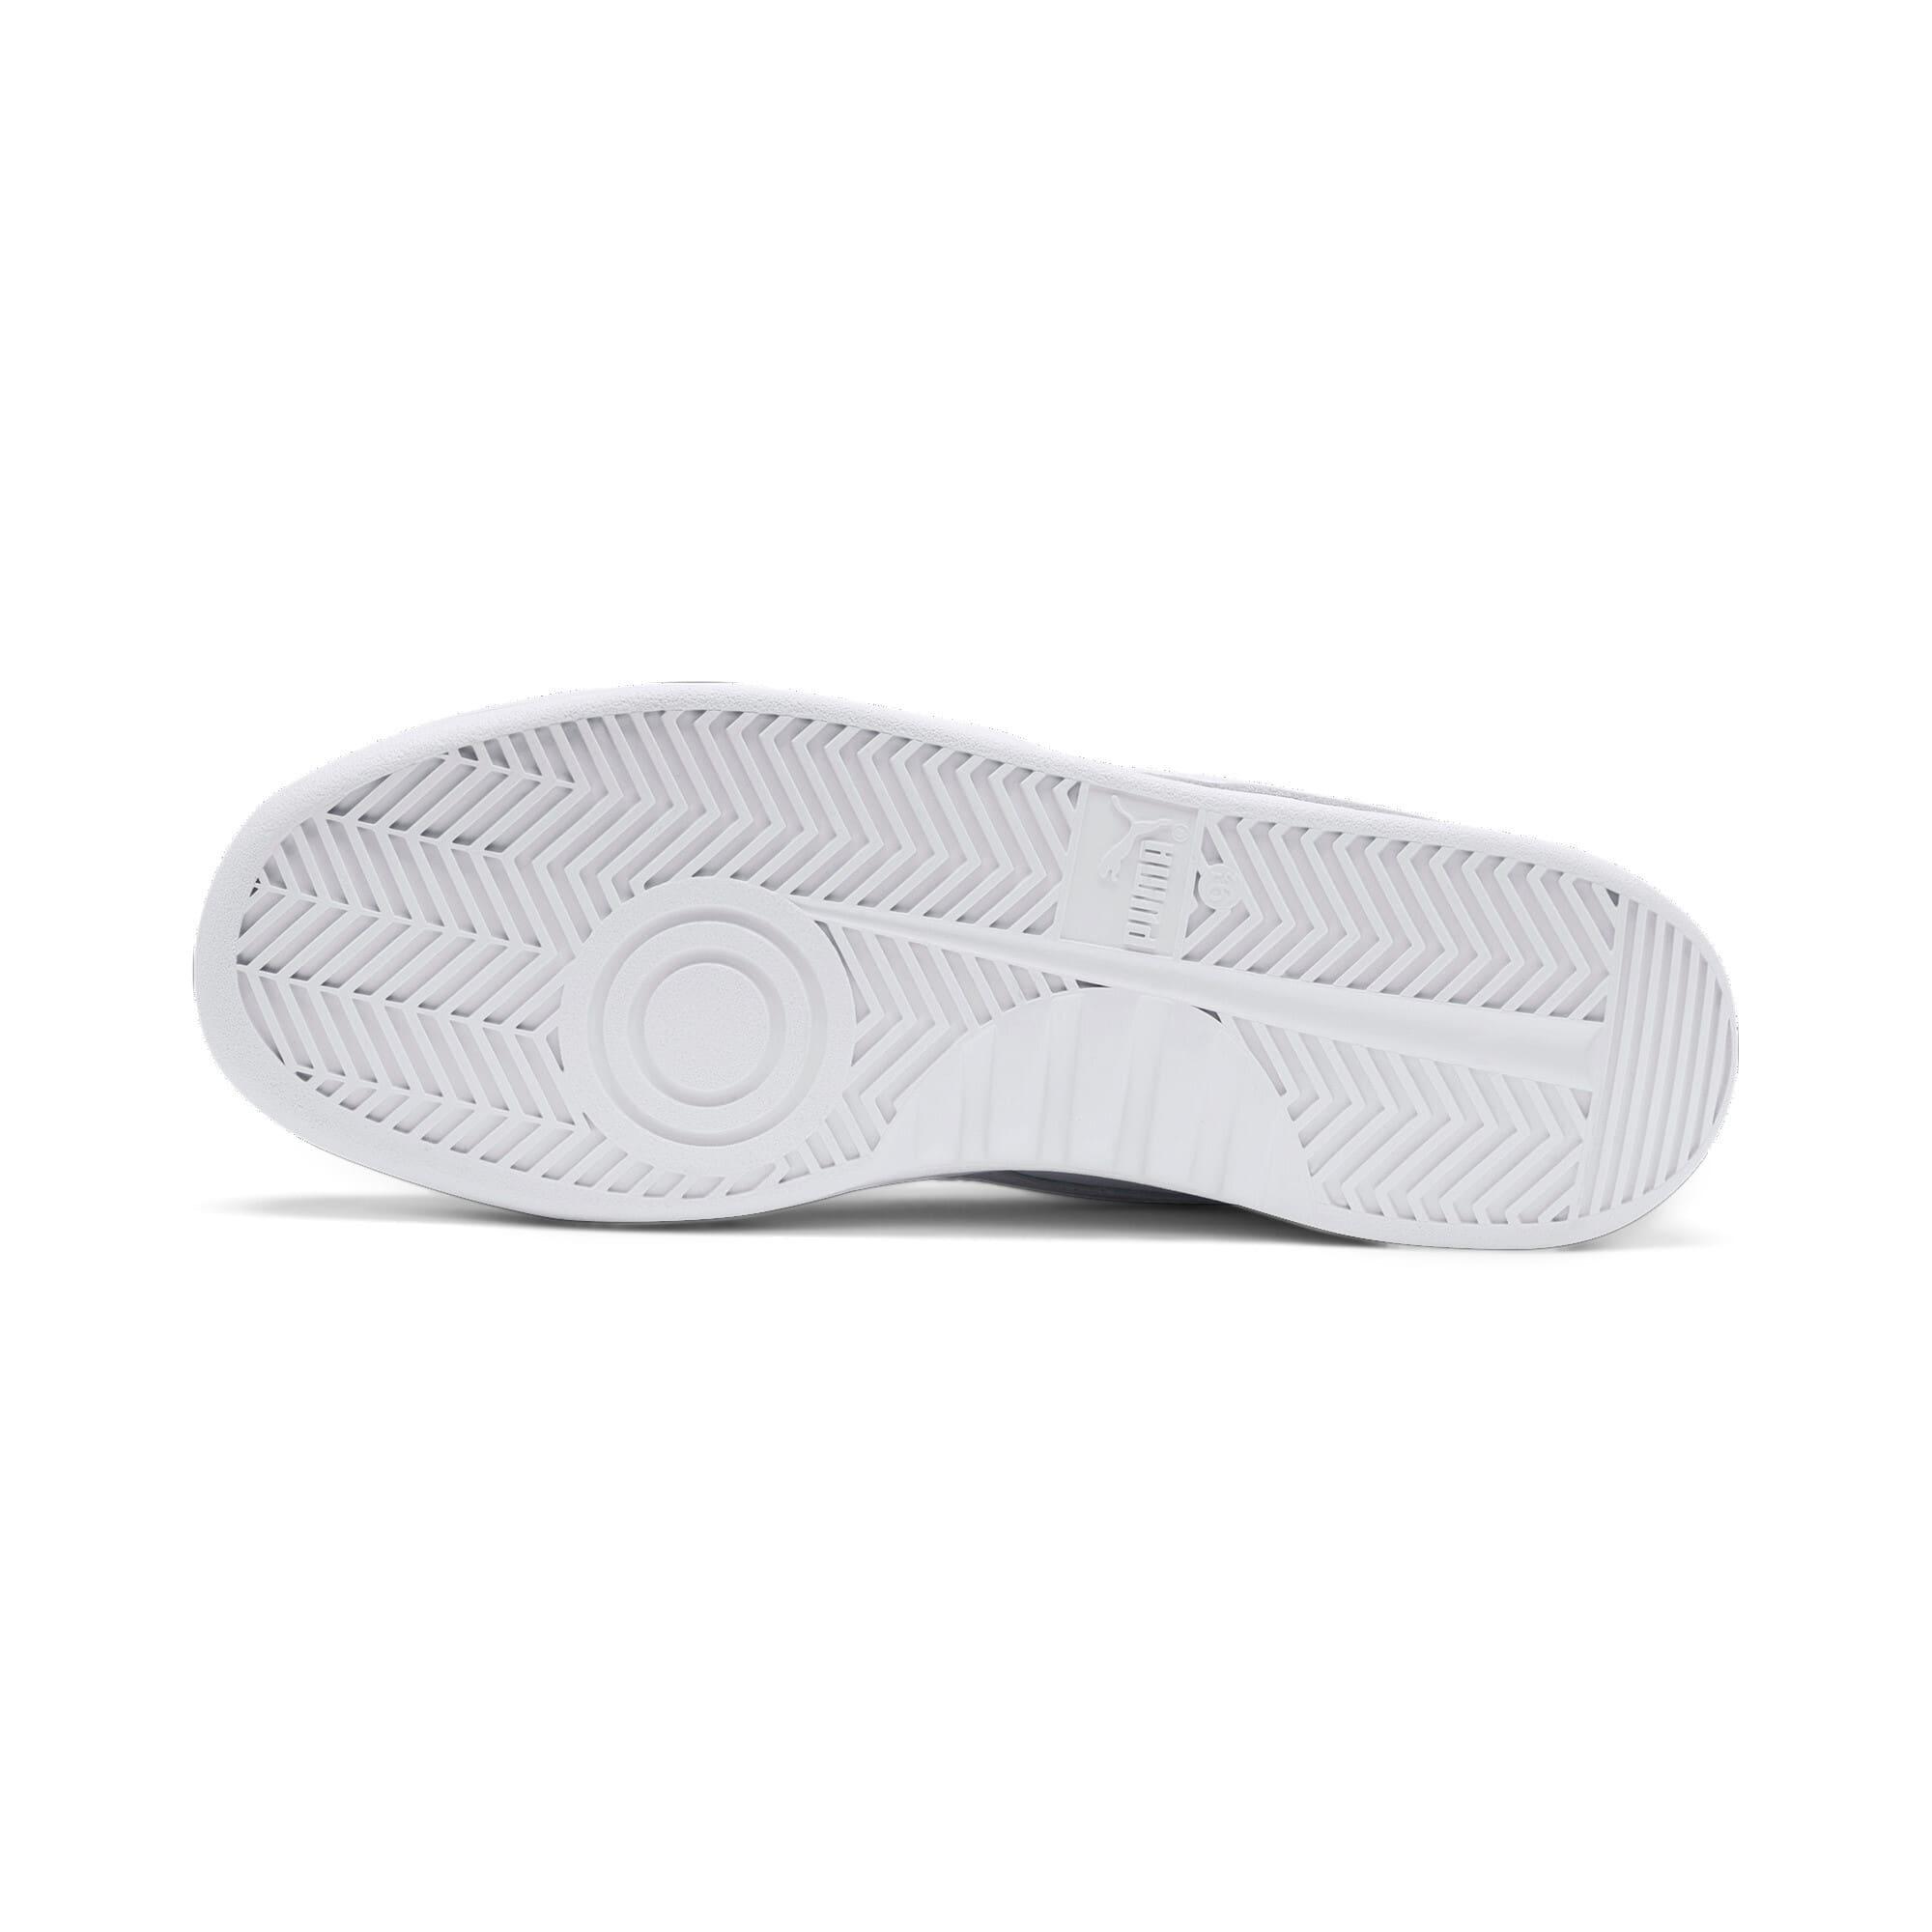 Thumbnail 4 of GV Special+ Sneakers, Puma White-Puma White, medium